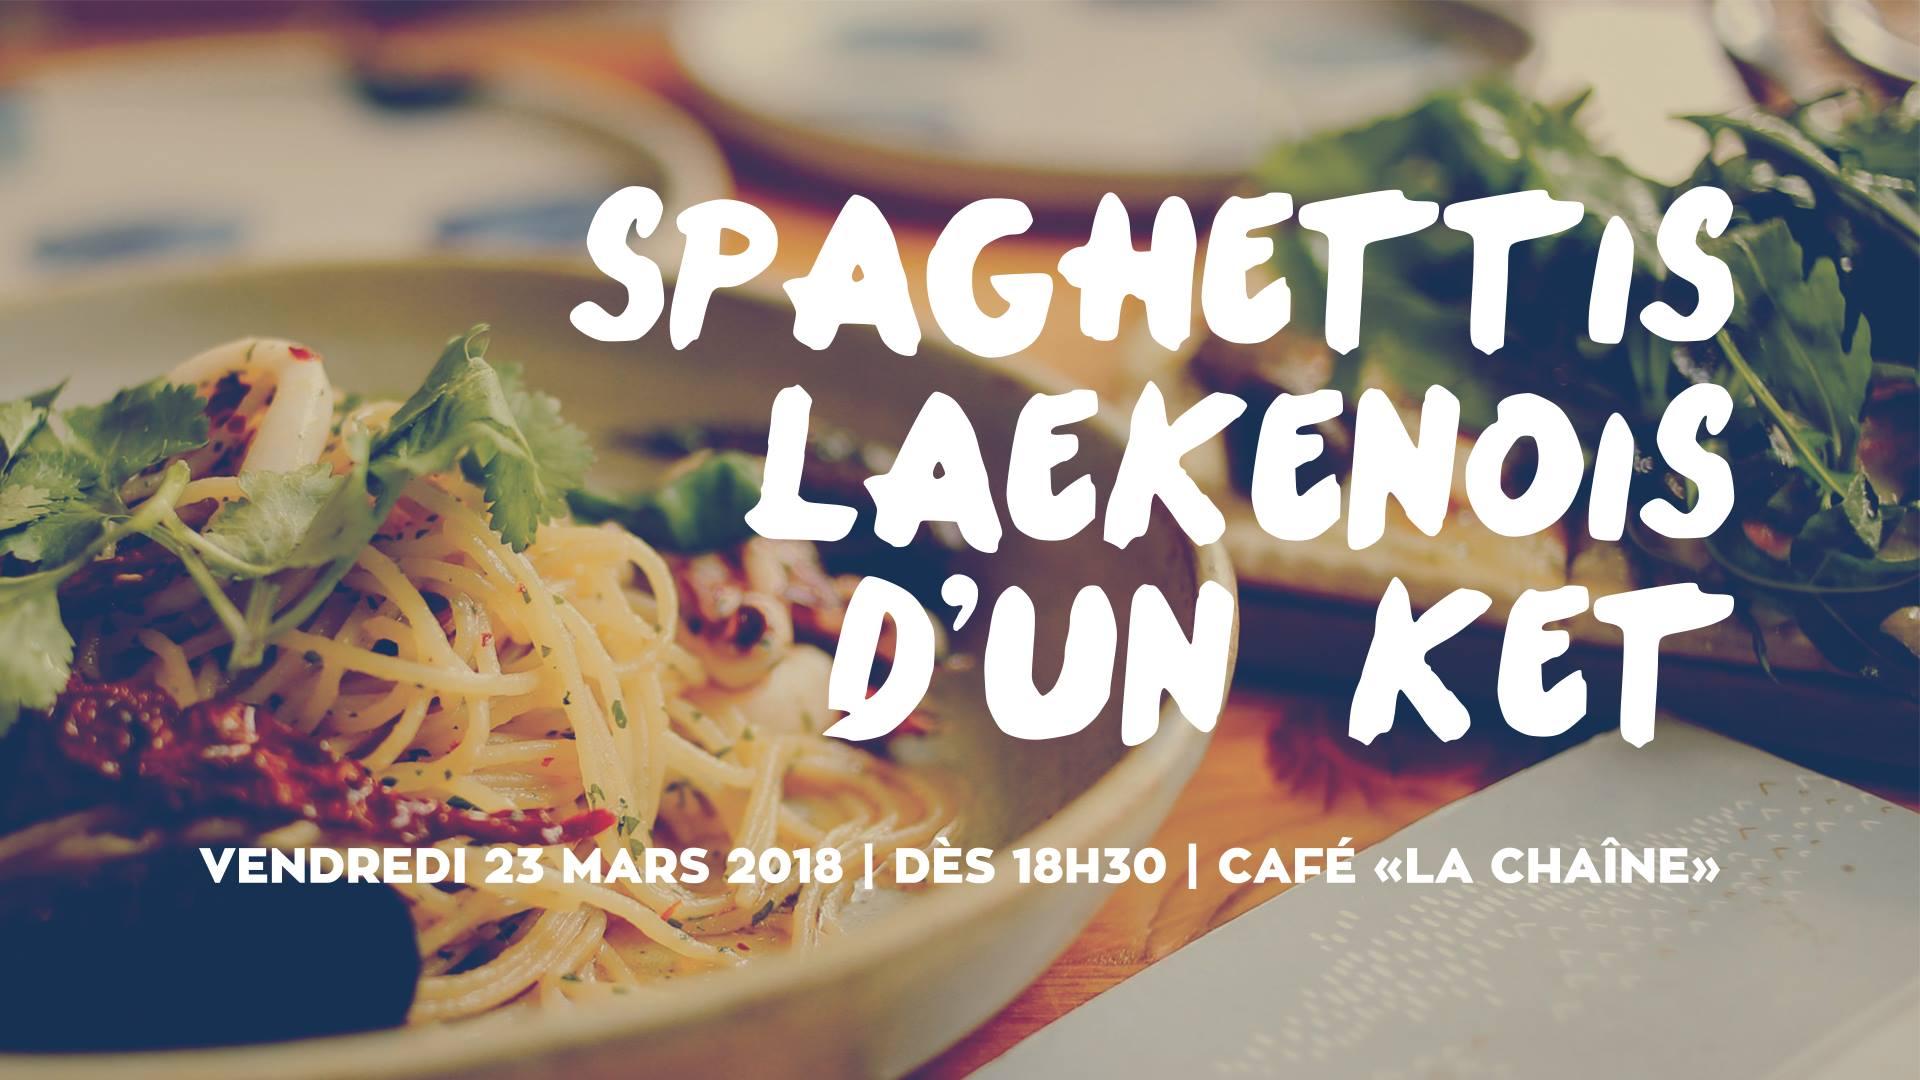 Spaghetti Laekenois d'un Ket !